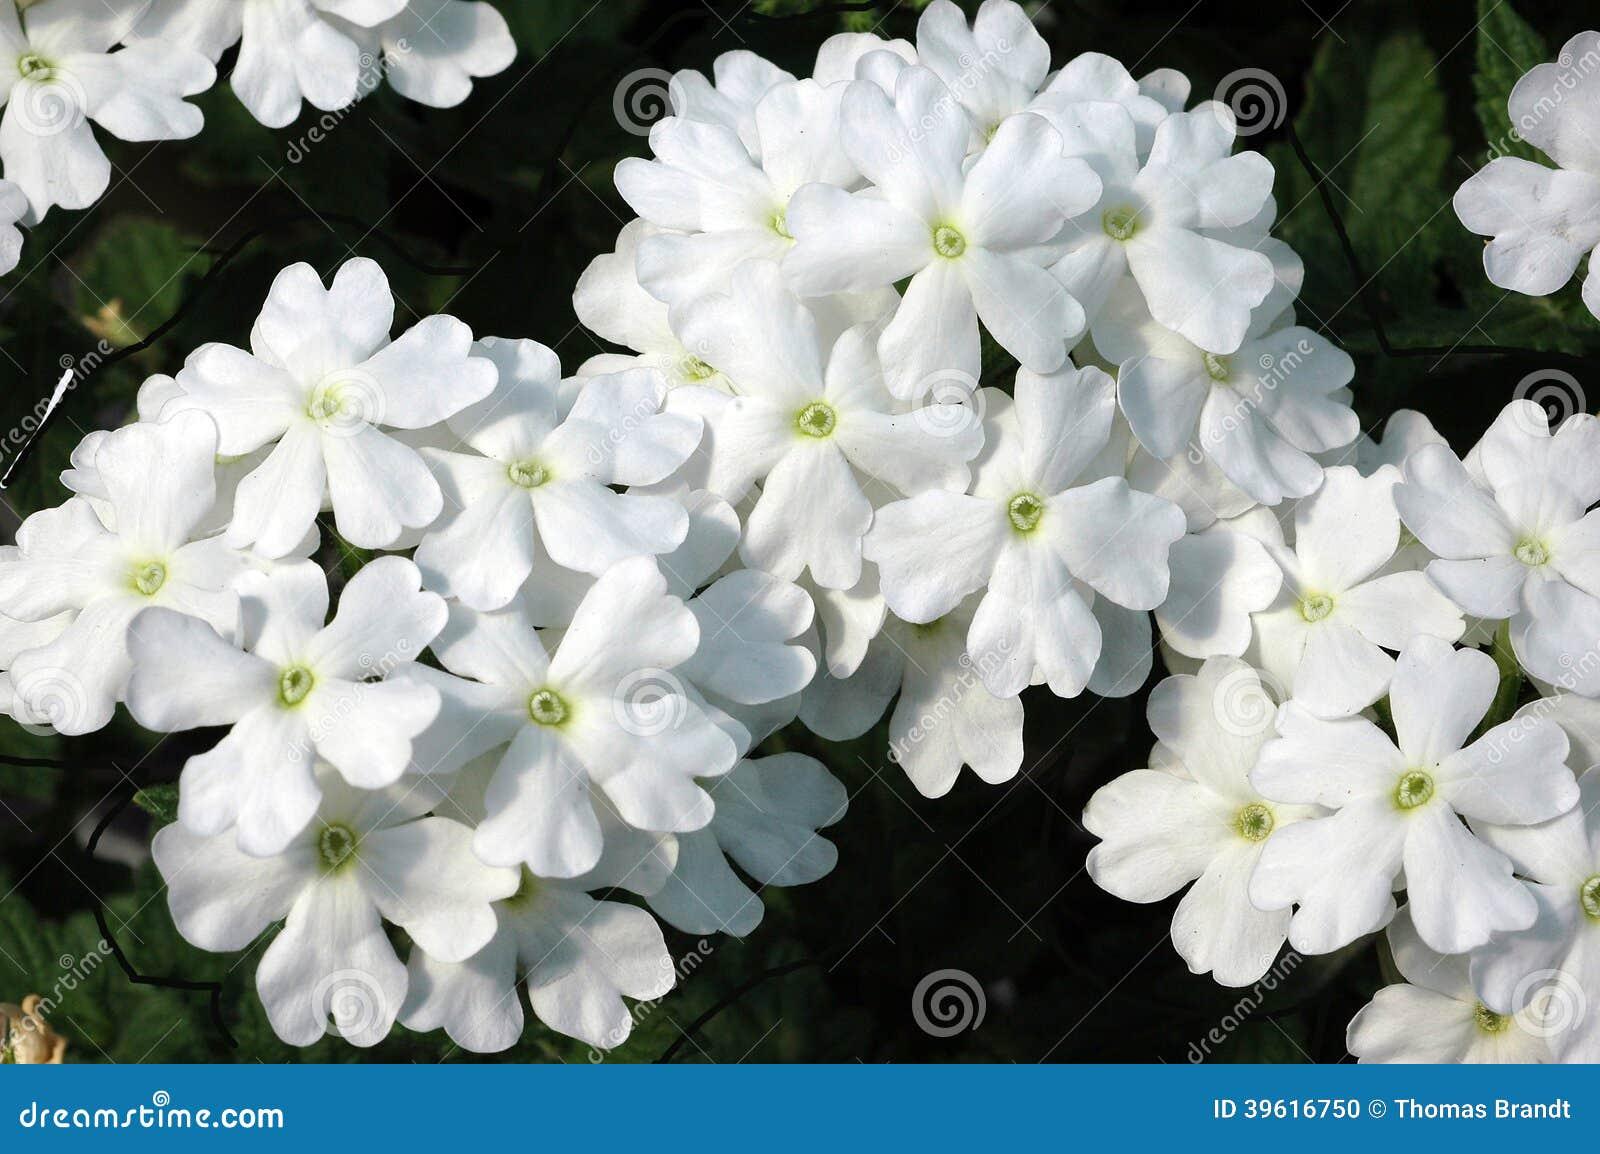 White Trailing Verbena Flowers Stock Photo - Image: 39616750